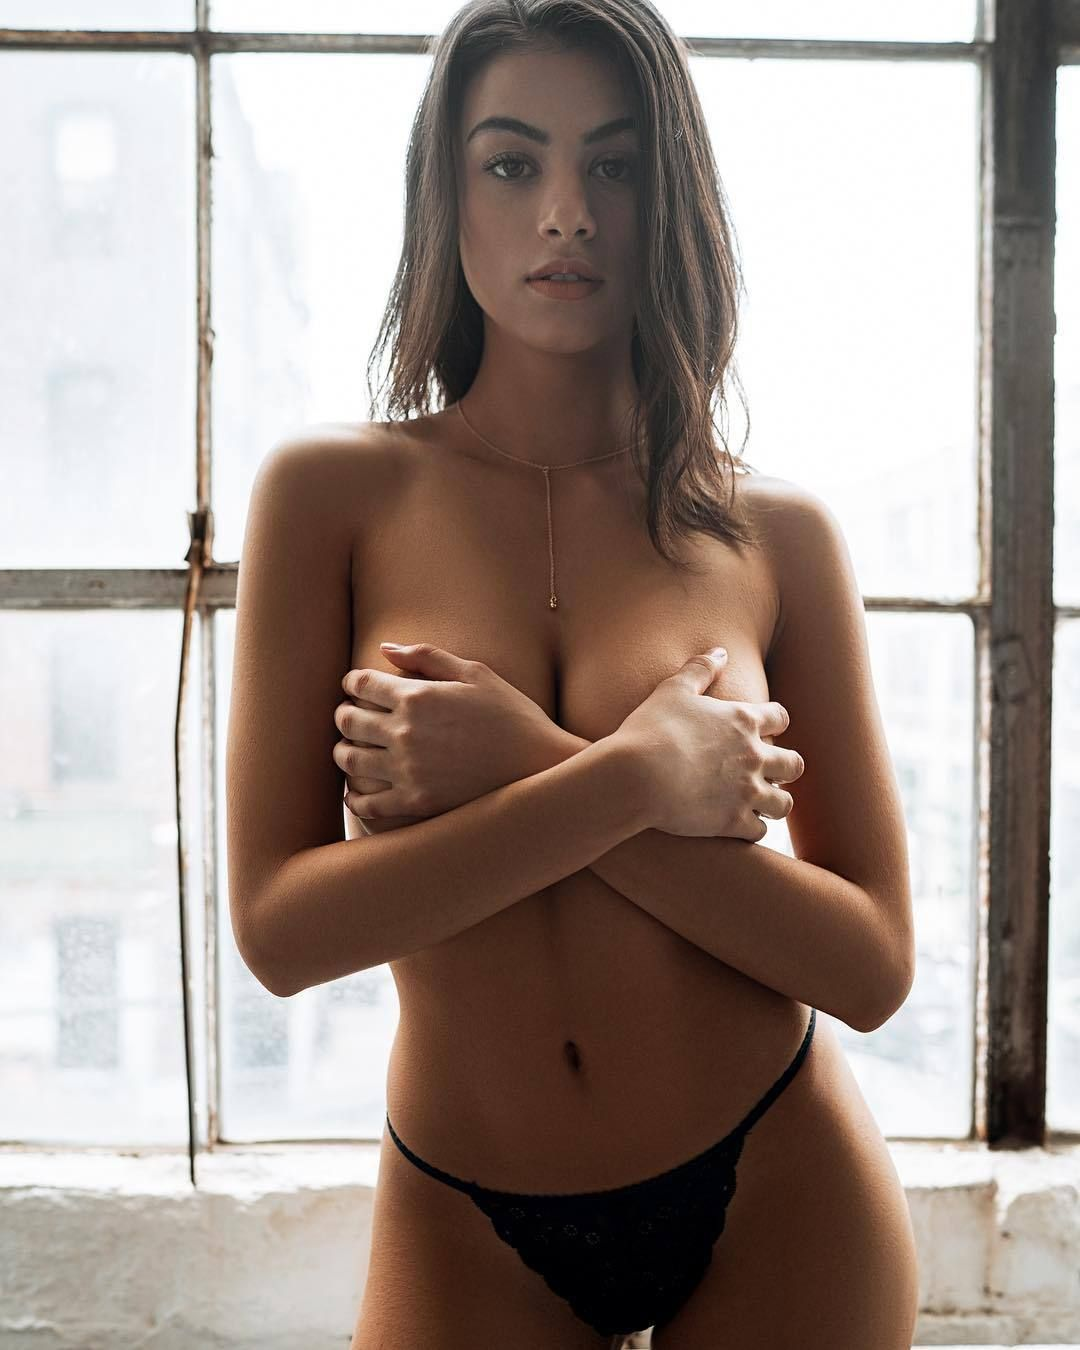 Hacked Loren Izabel nudes (37 photos), Tits, Hot, Boobs, underwear 2015